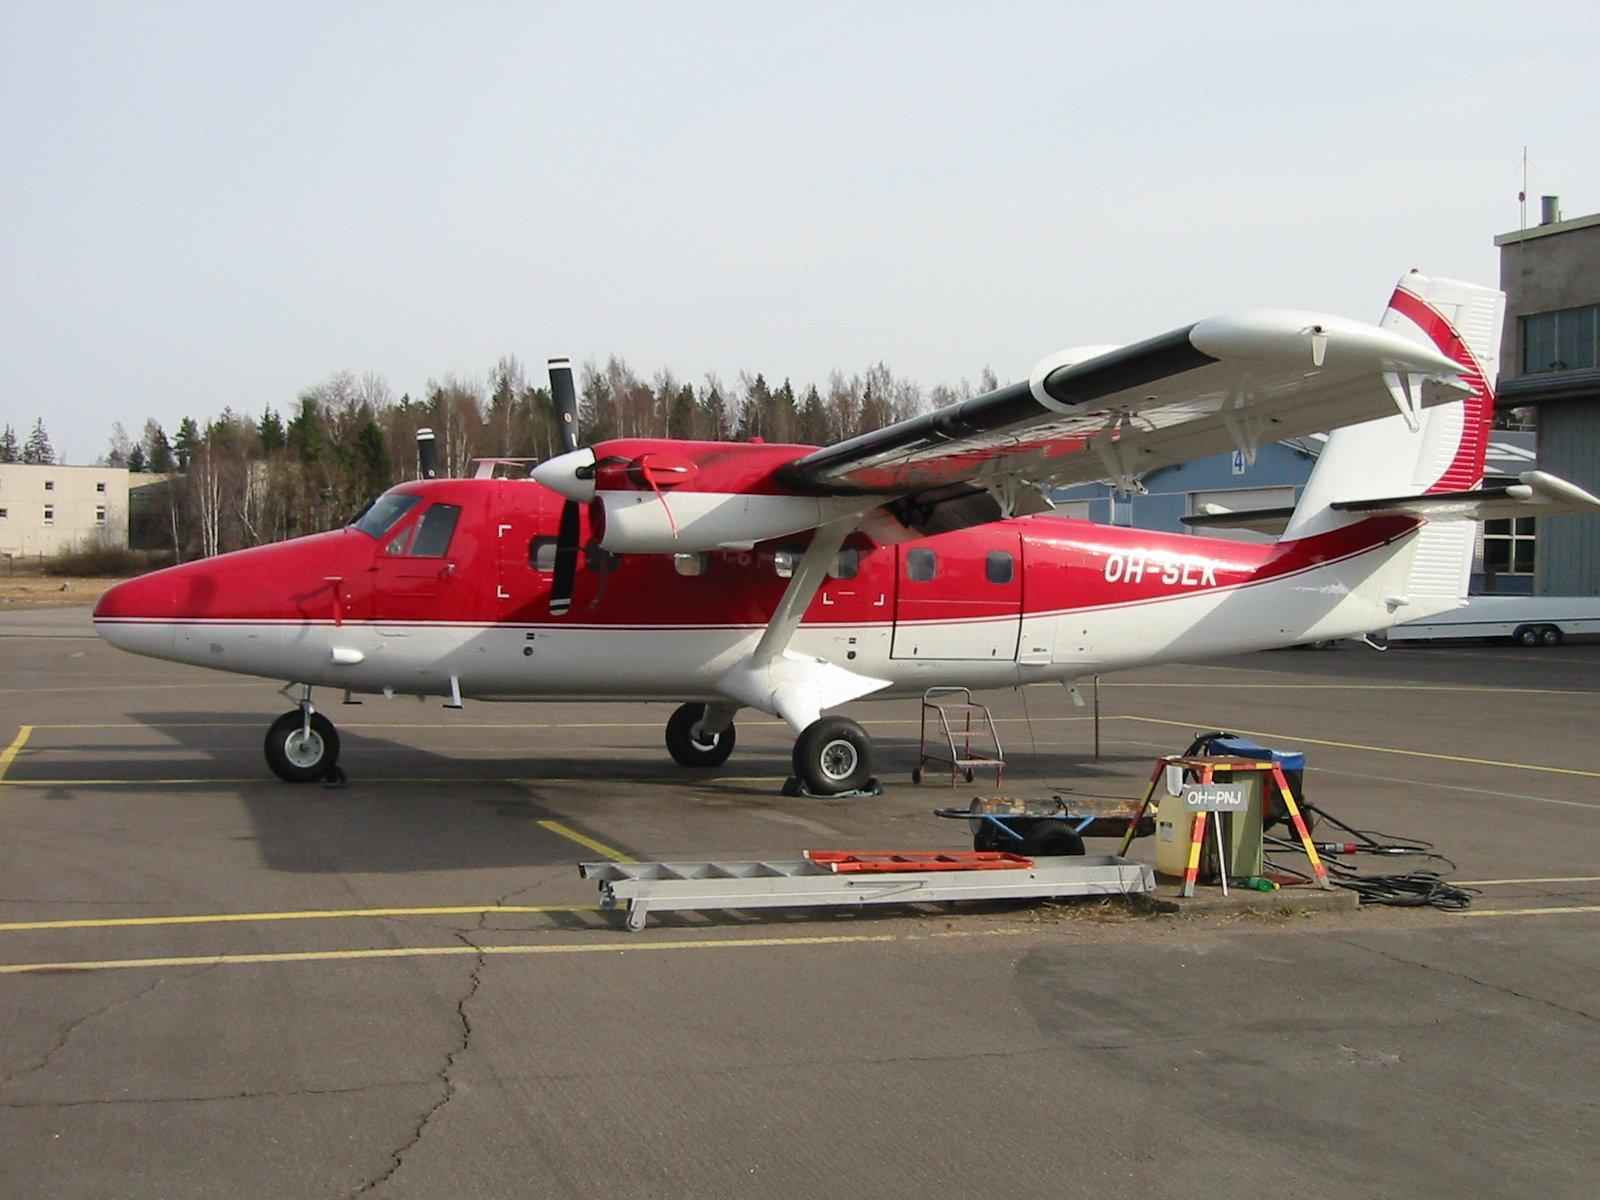 DHC-6-300 Twin Otter OH-SLK EFHF 2003-04-27